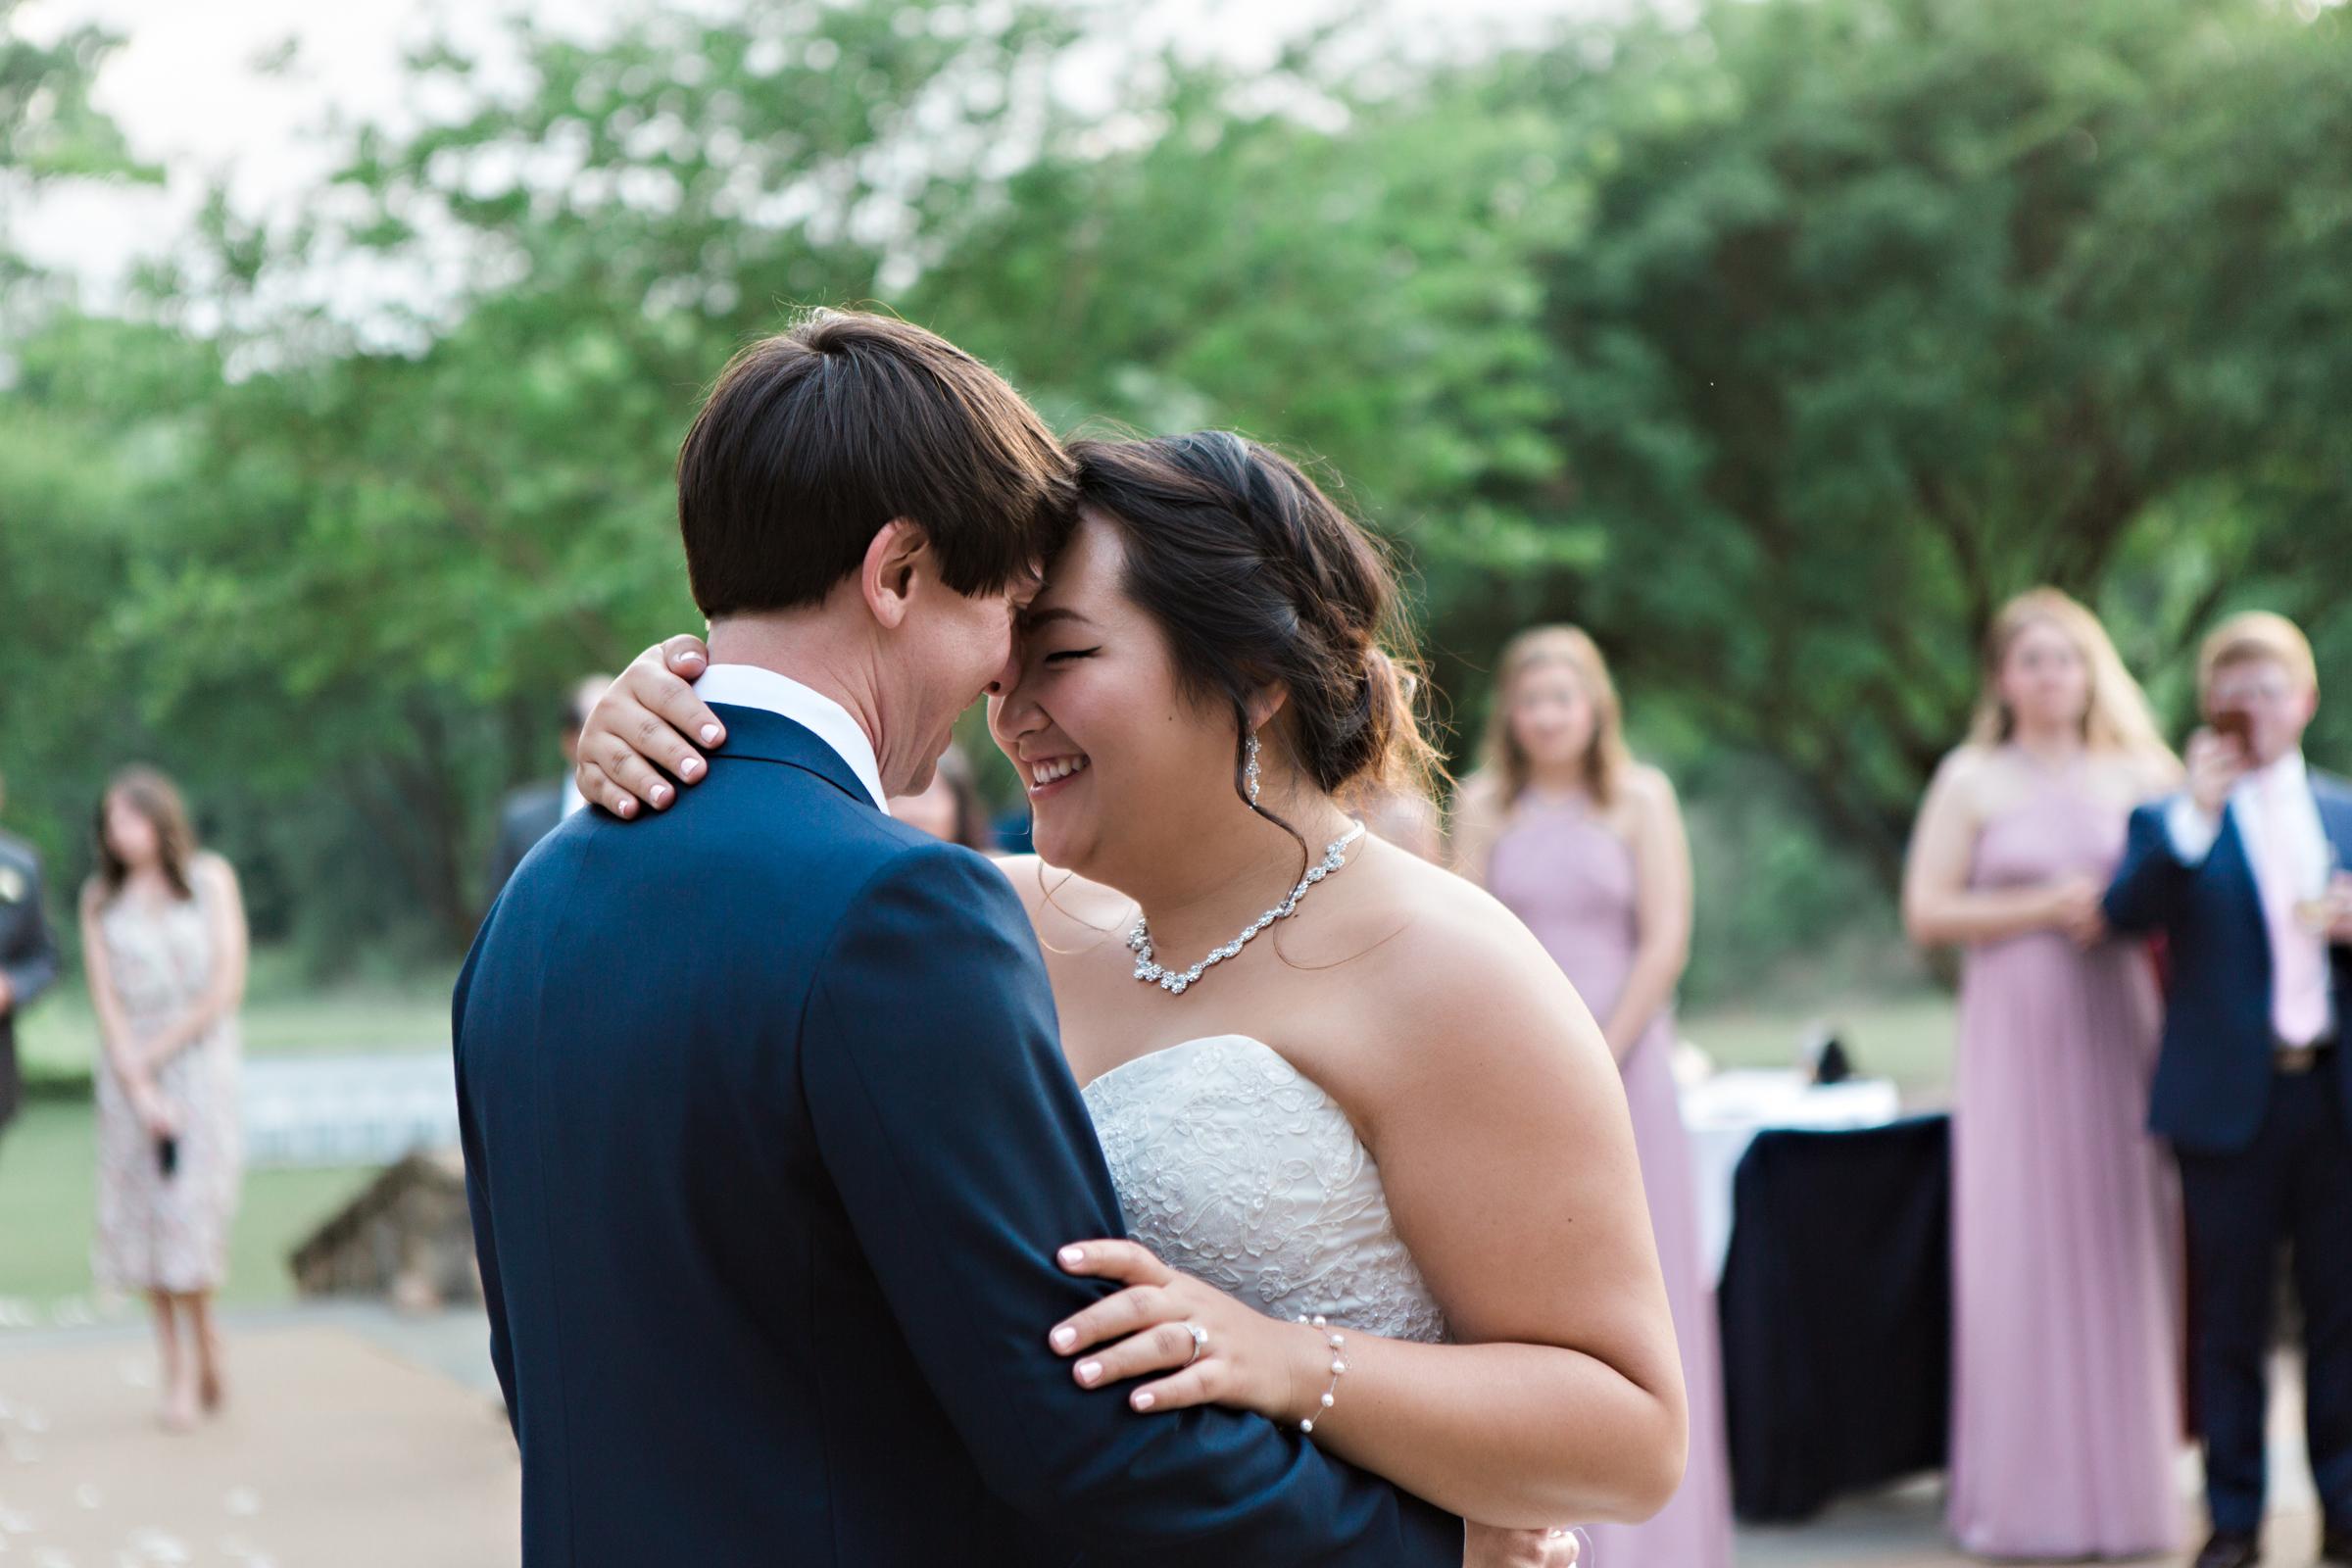 Ni ck-Drollette-Photography-Auburn-Alabama-Weddings-Sylvia-Kevin-160.jpg